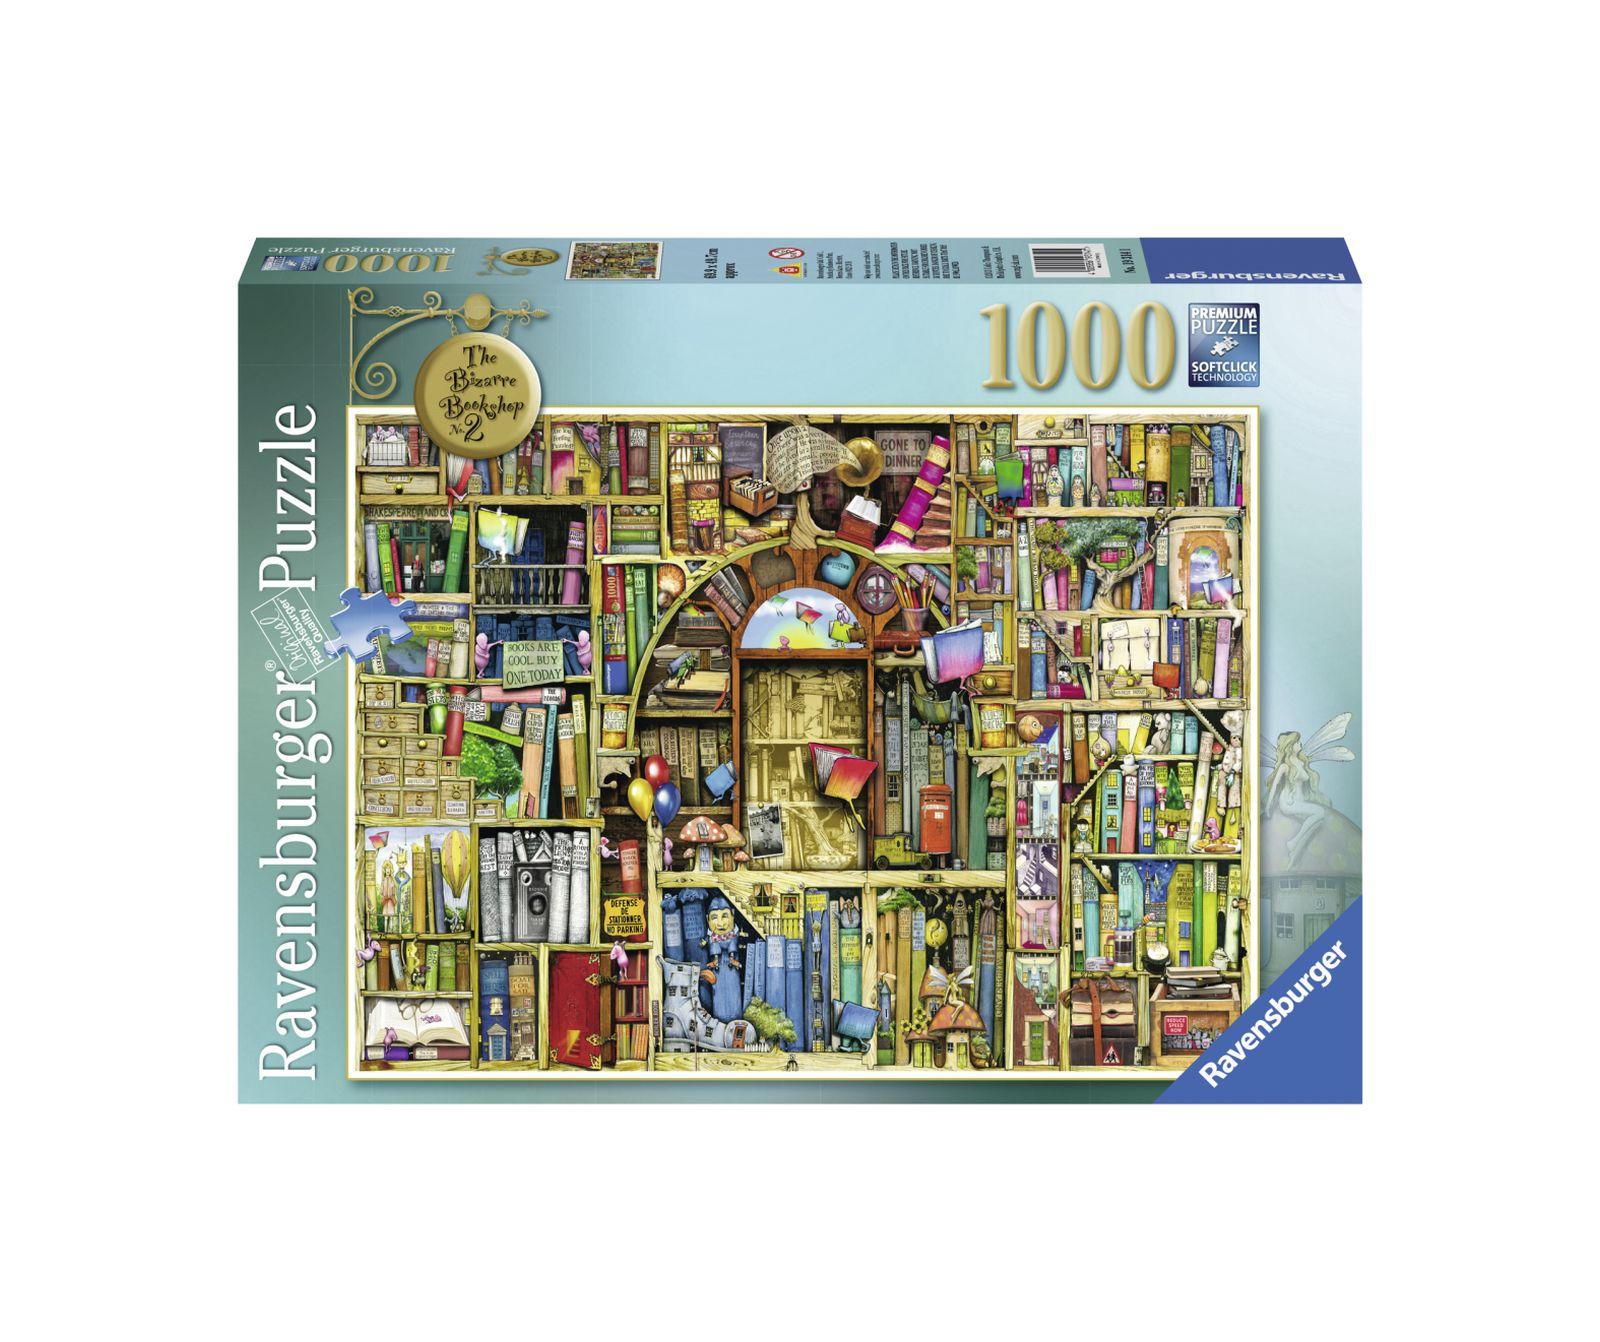 Ravensburger puzzle 1000 pezzi la biblioteca bizzarra 2 - Ravensburger1